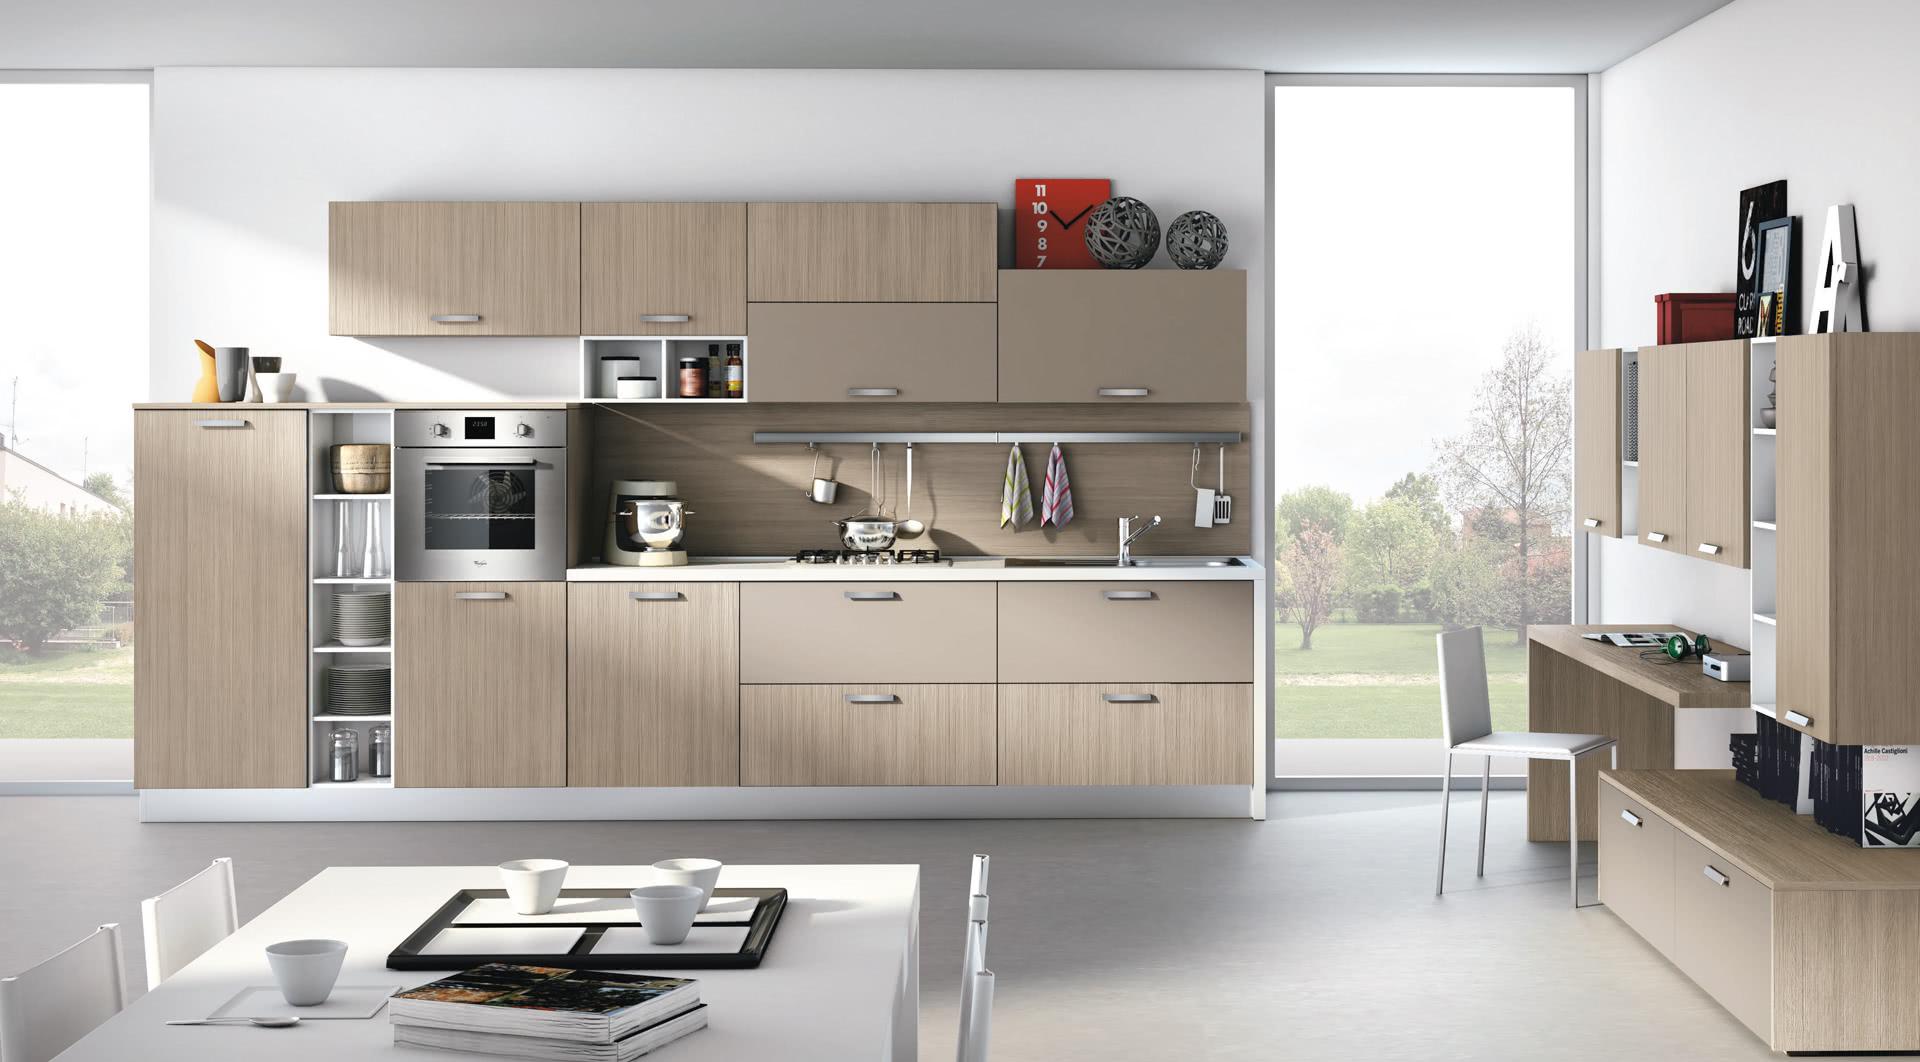 Cucina Alma - Cucine Moderne - Creo Kitchens